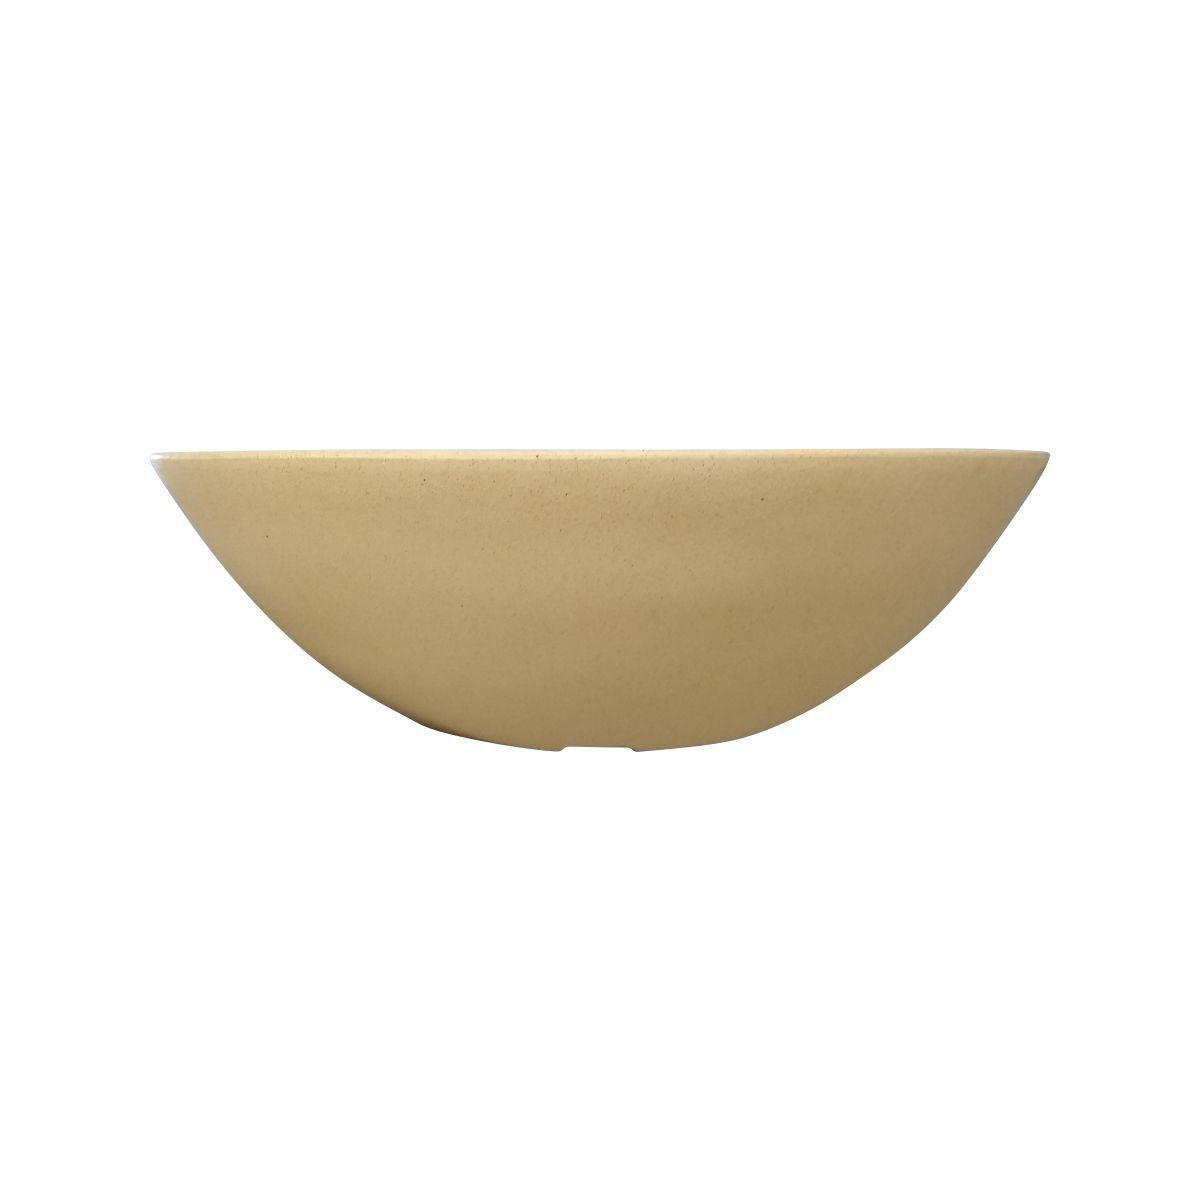 Vaso Bacia Médio cor Areia Claro 17cm x 52cm - 6725